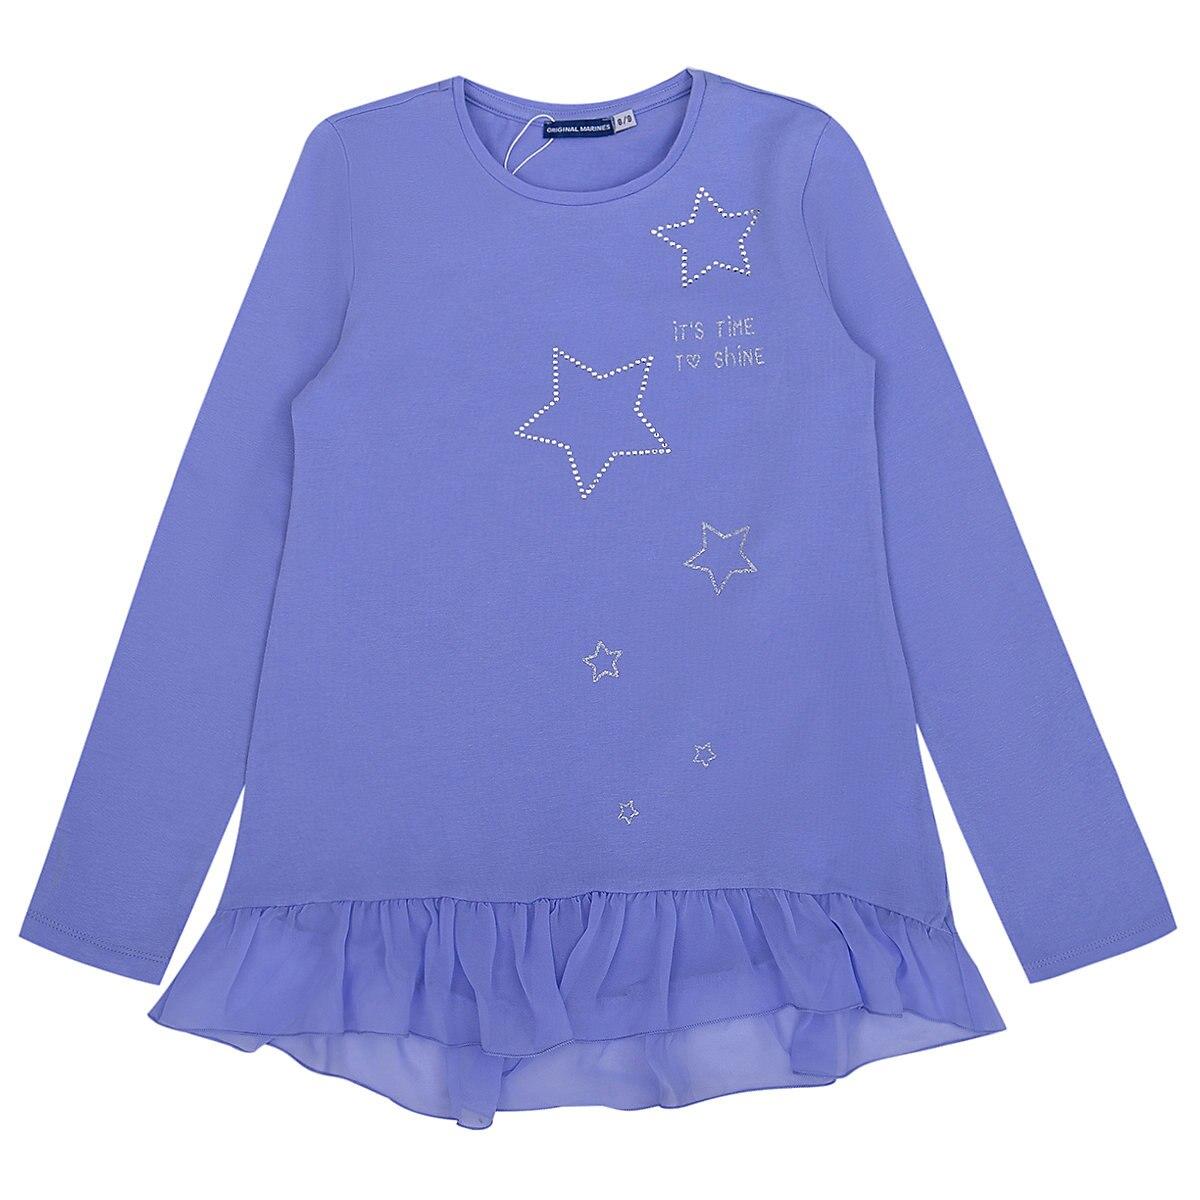 Original Marines Hoodies & Sweatshirts 9501396 Cotton Girls Casual children clothing girl hoodies